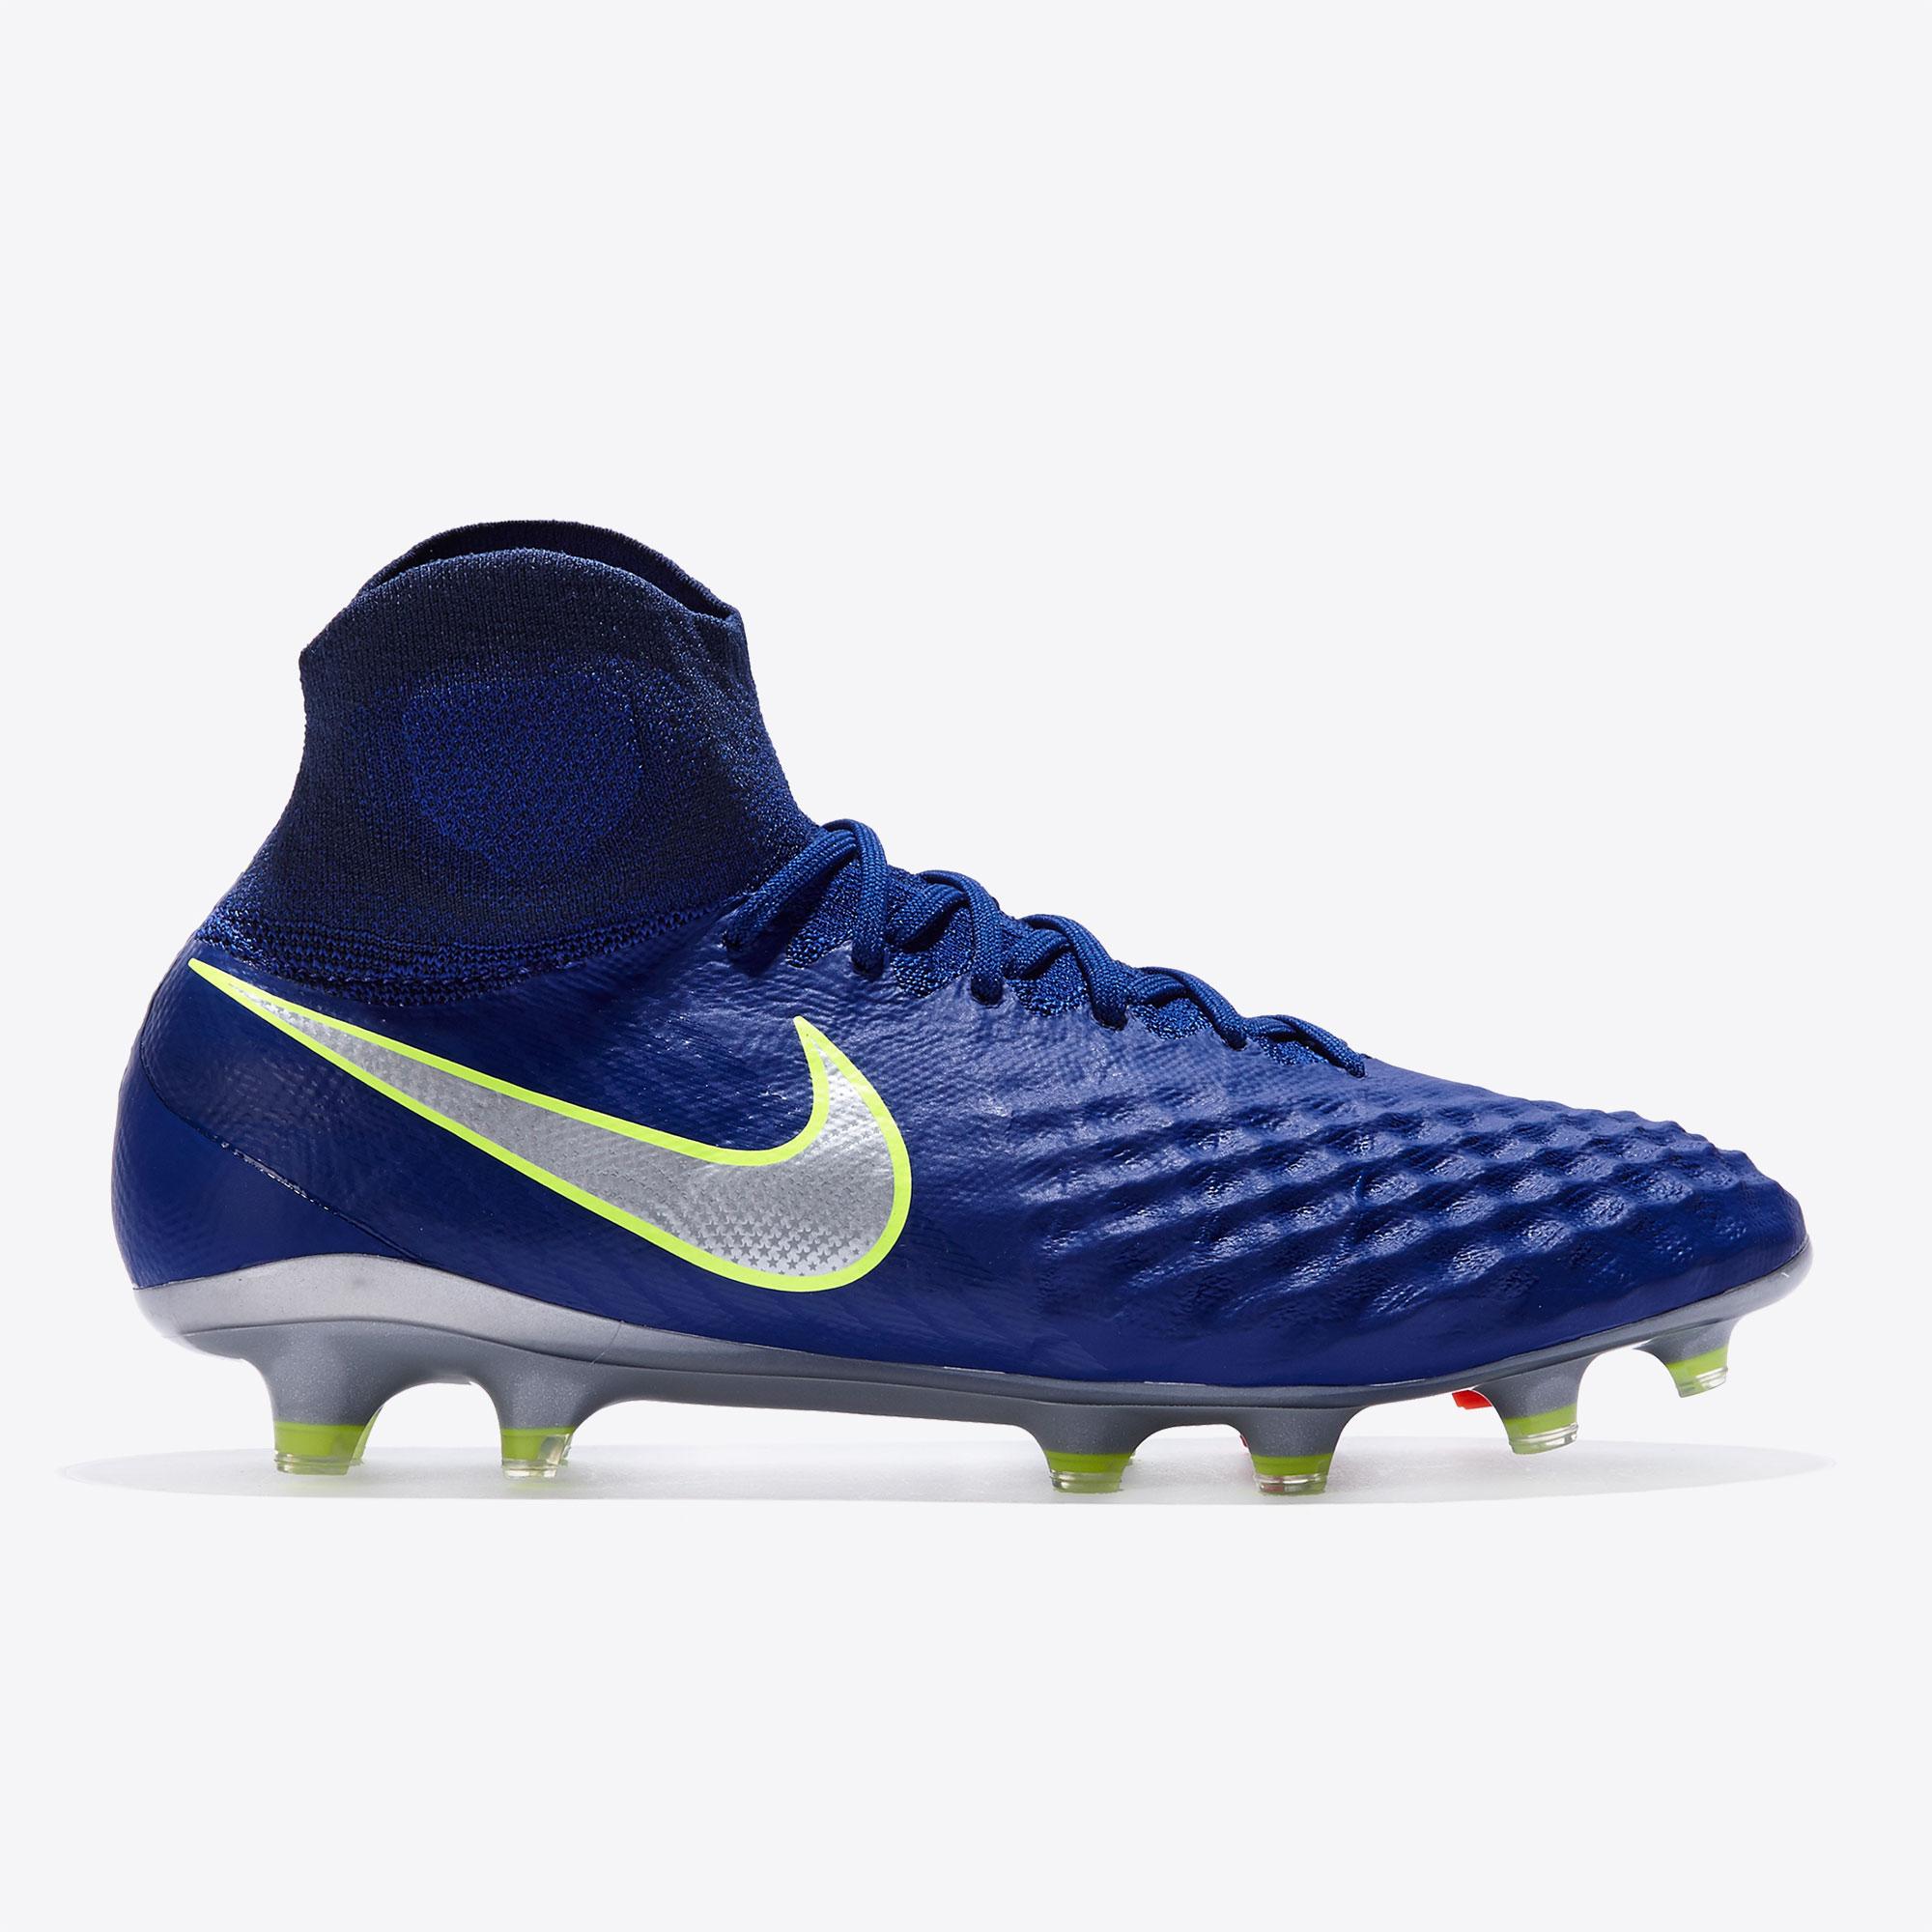 Nike Magista Obra II FG Deep Royal Blue/Chro